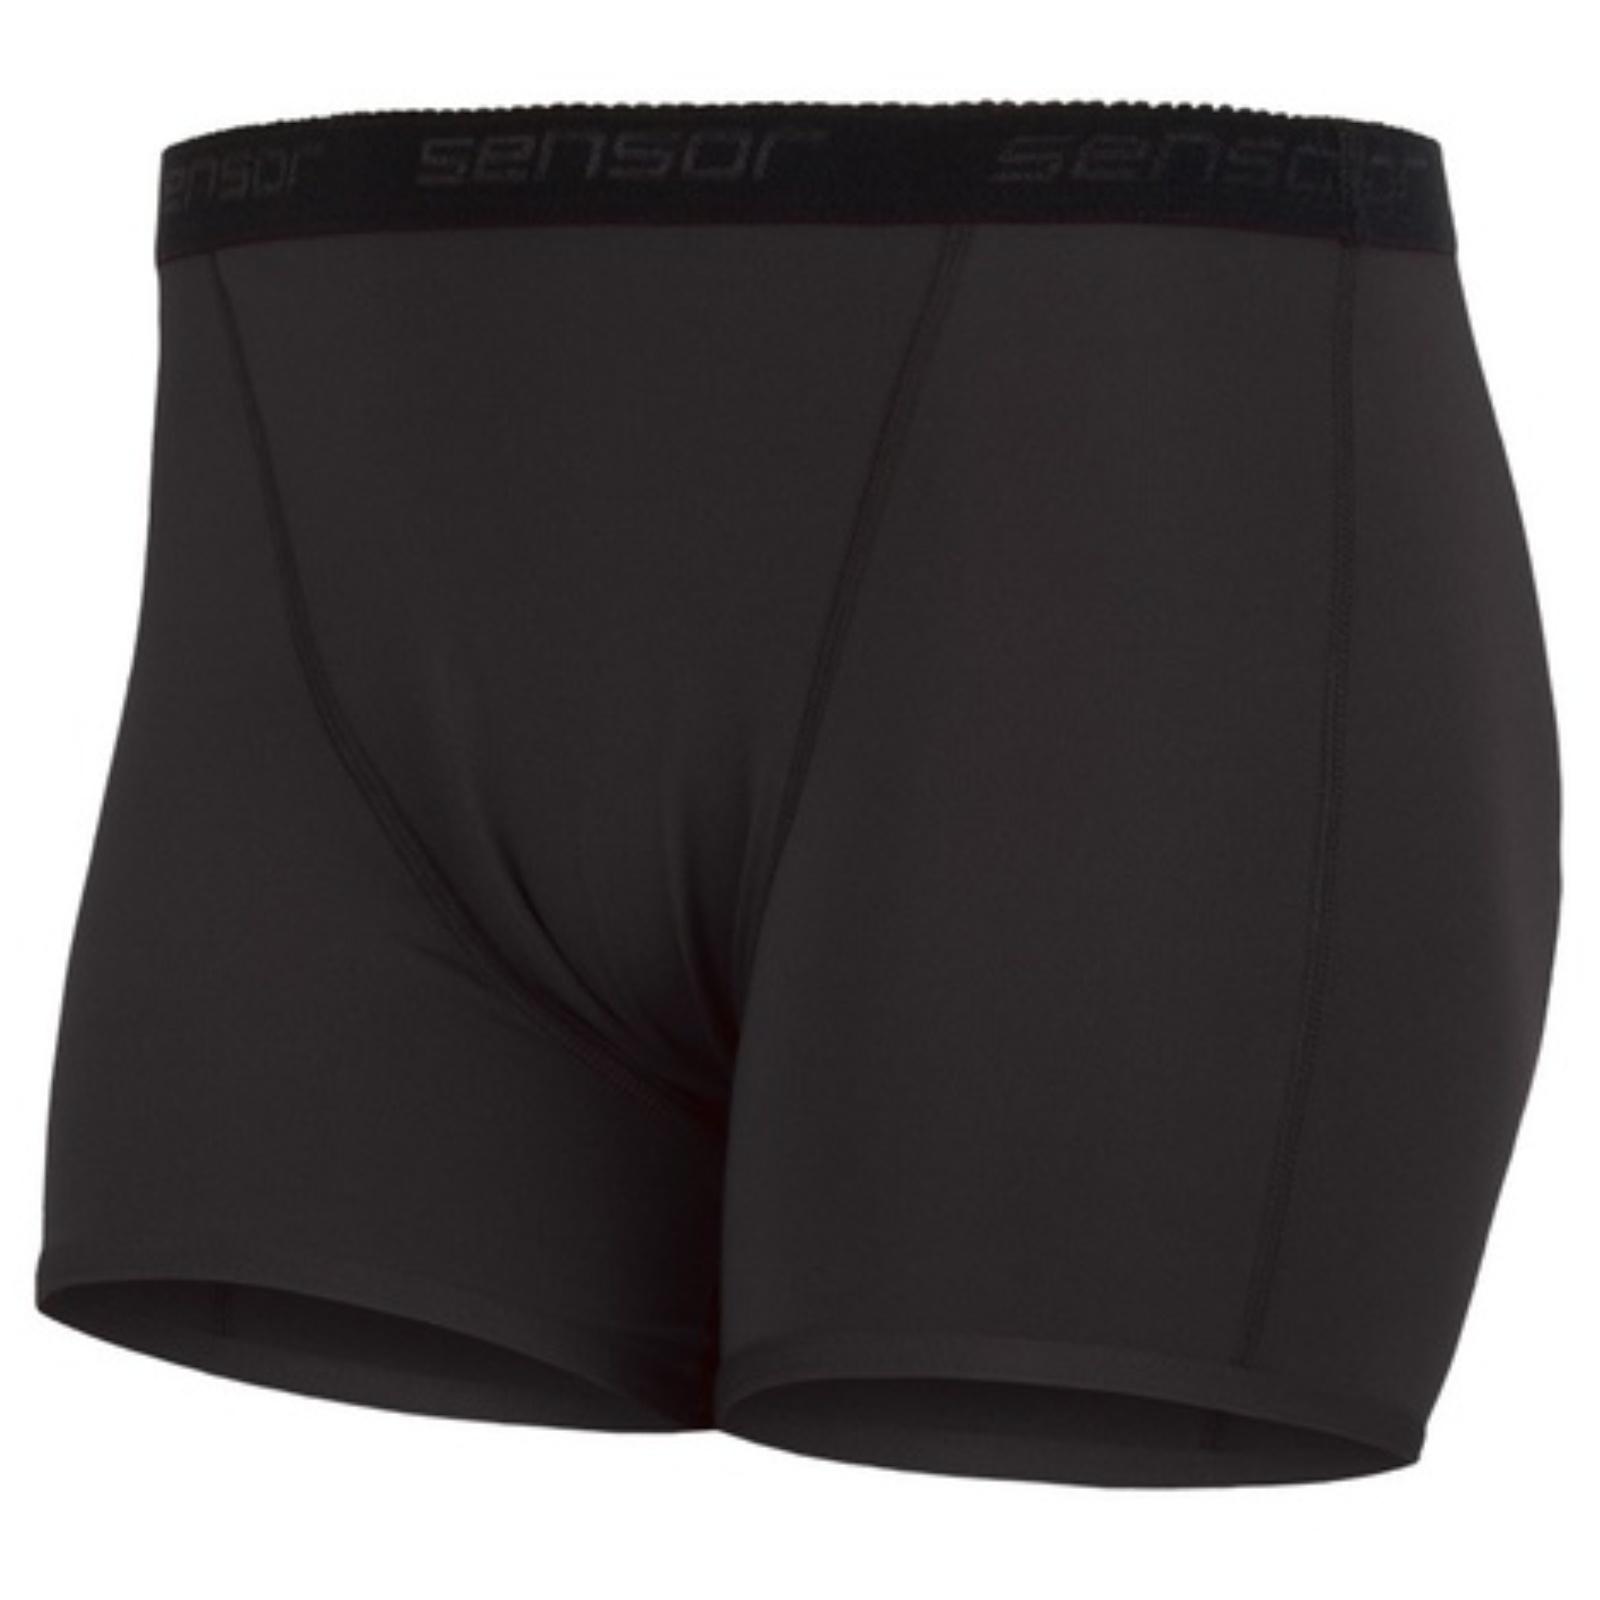 Kalhotky SENSOR Coolmax Fresh černé - vel. M